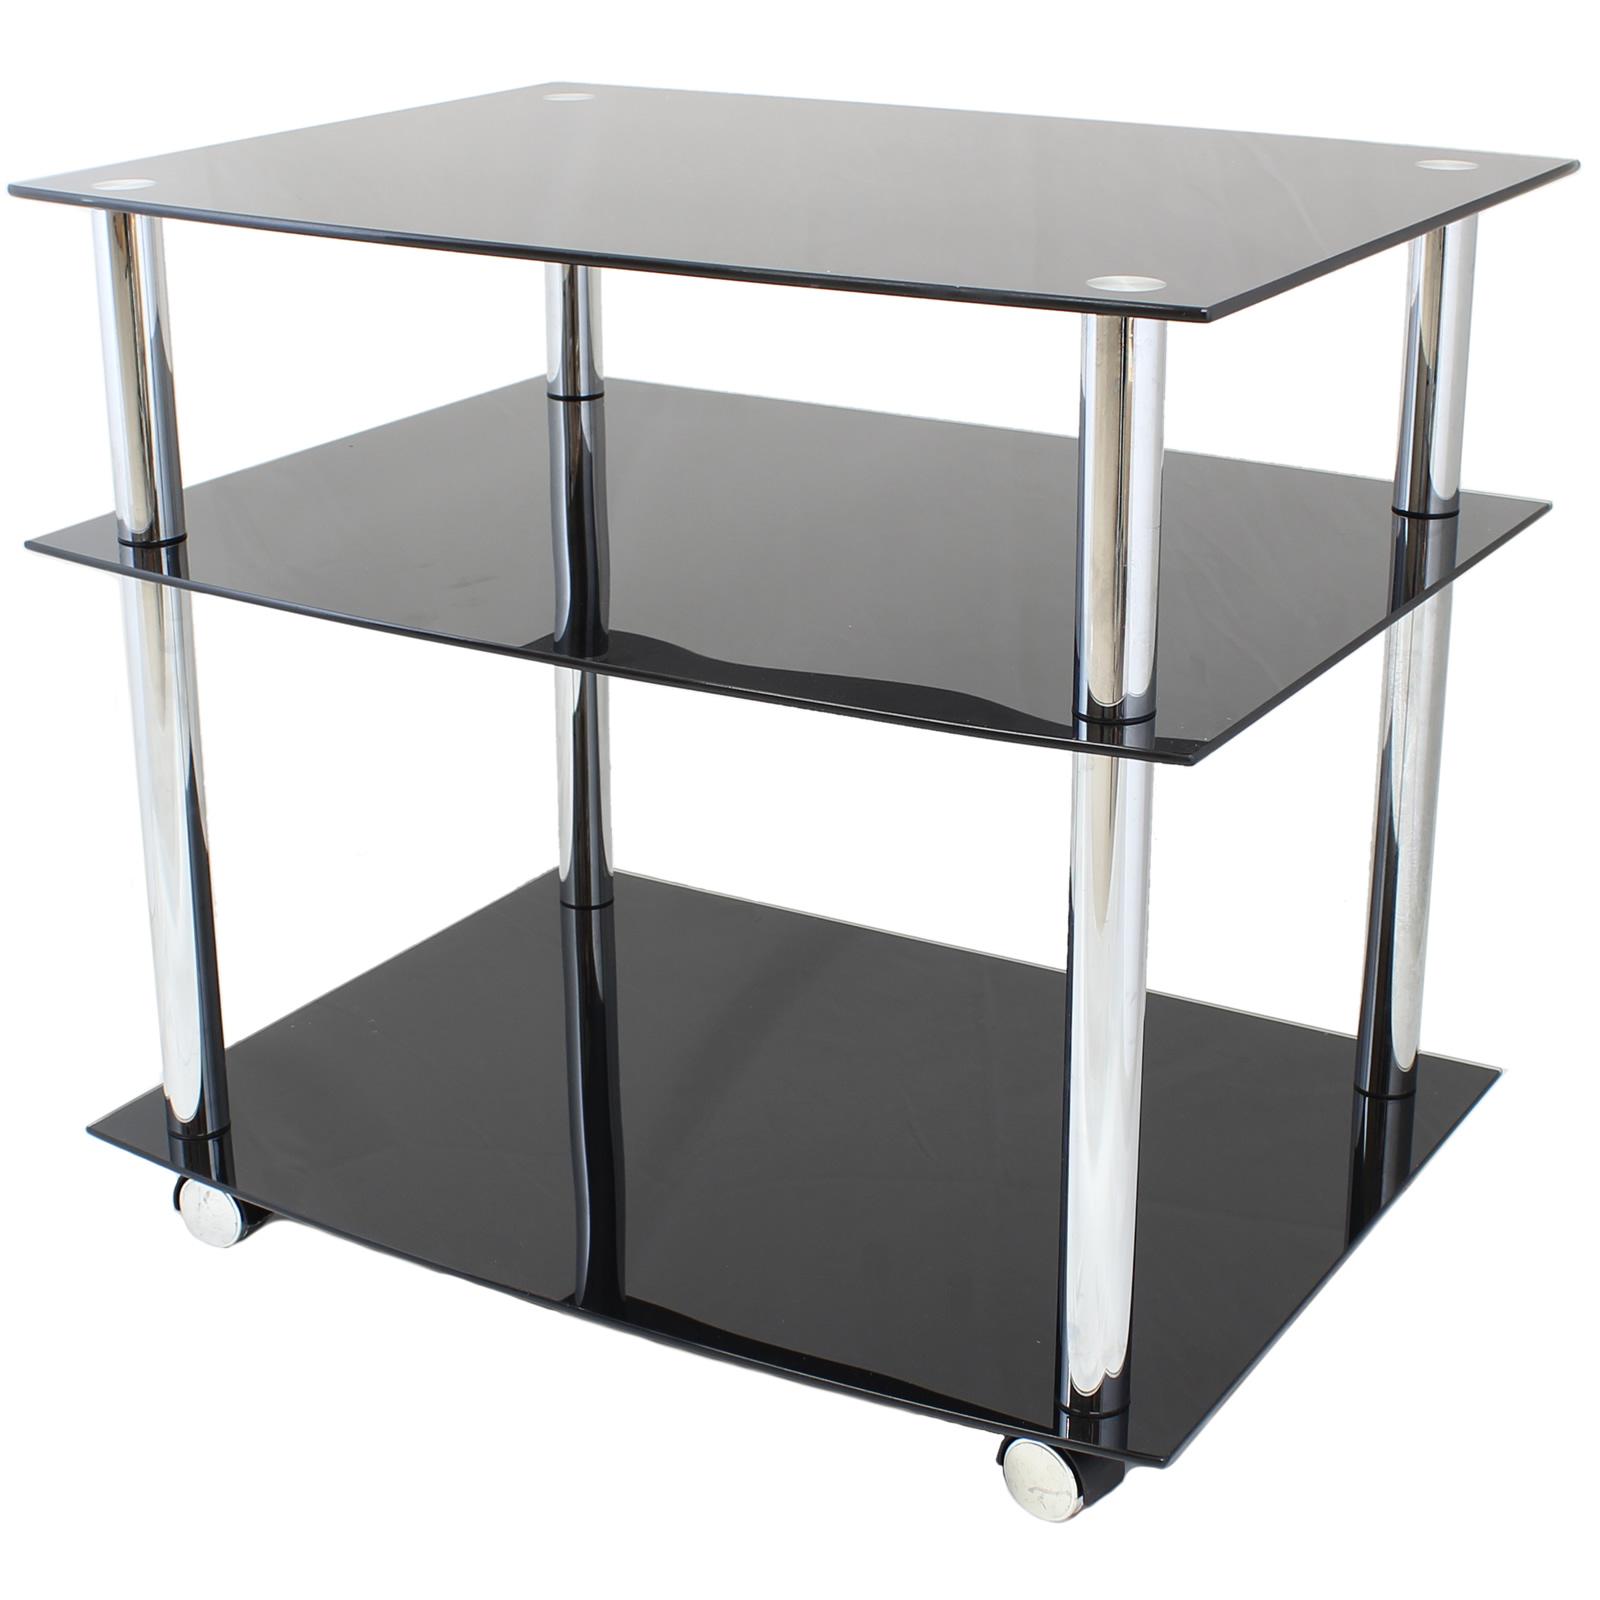 mobile glass tv av unit shelf stand projector trolley